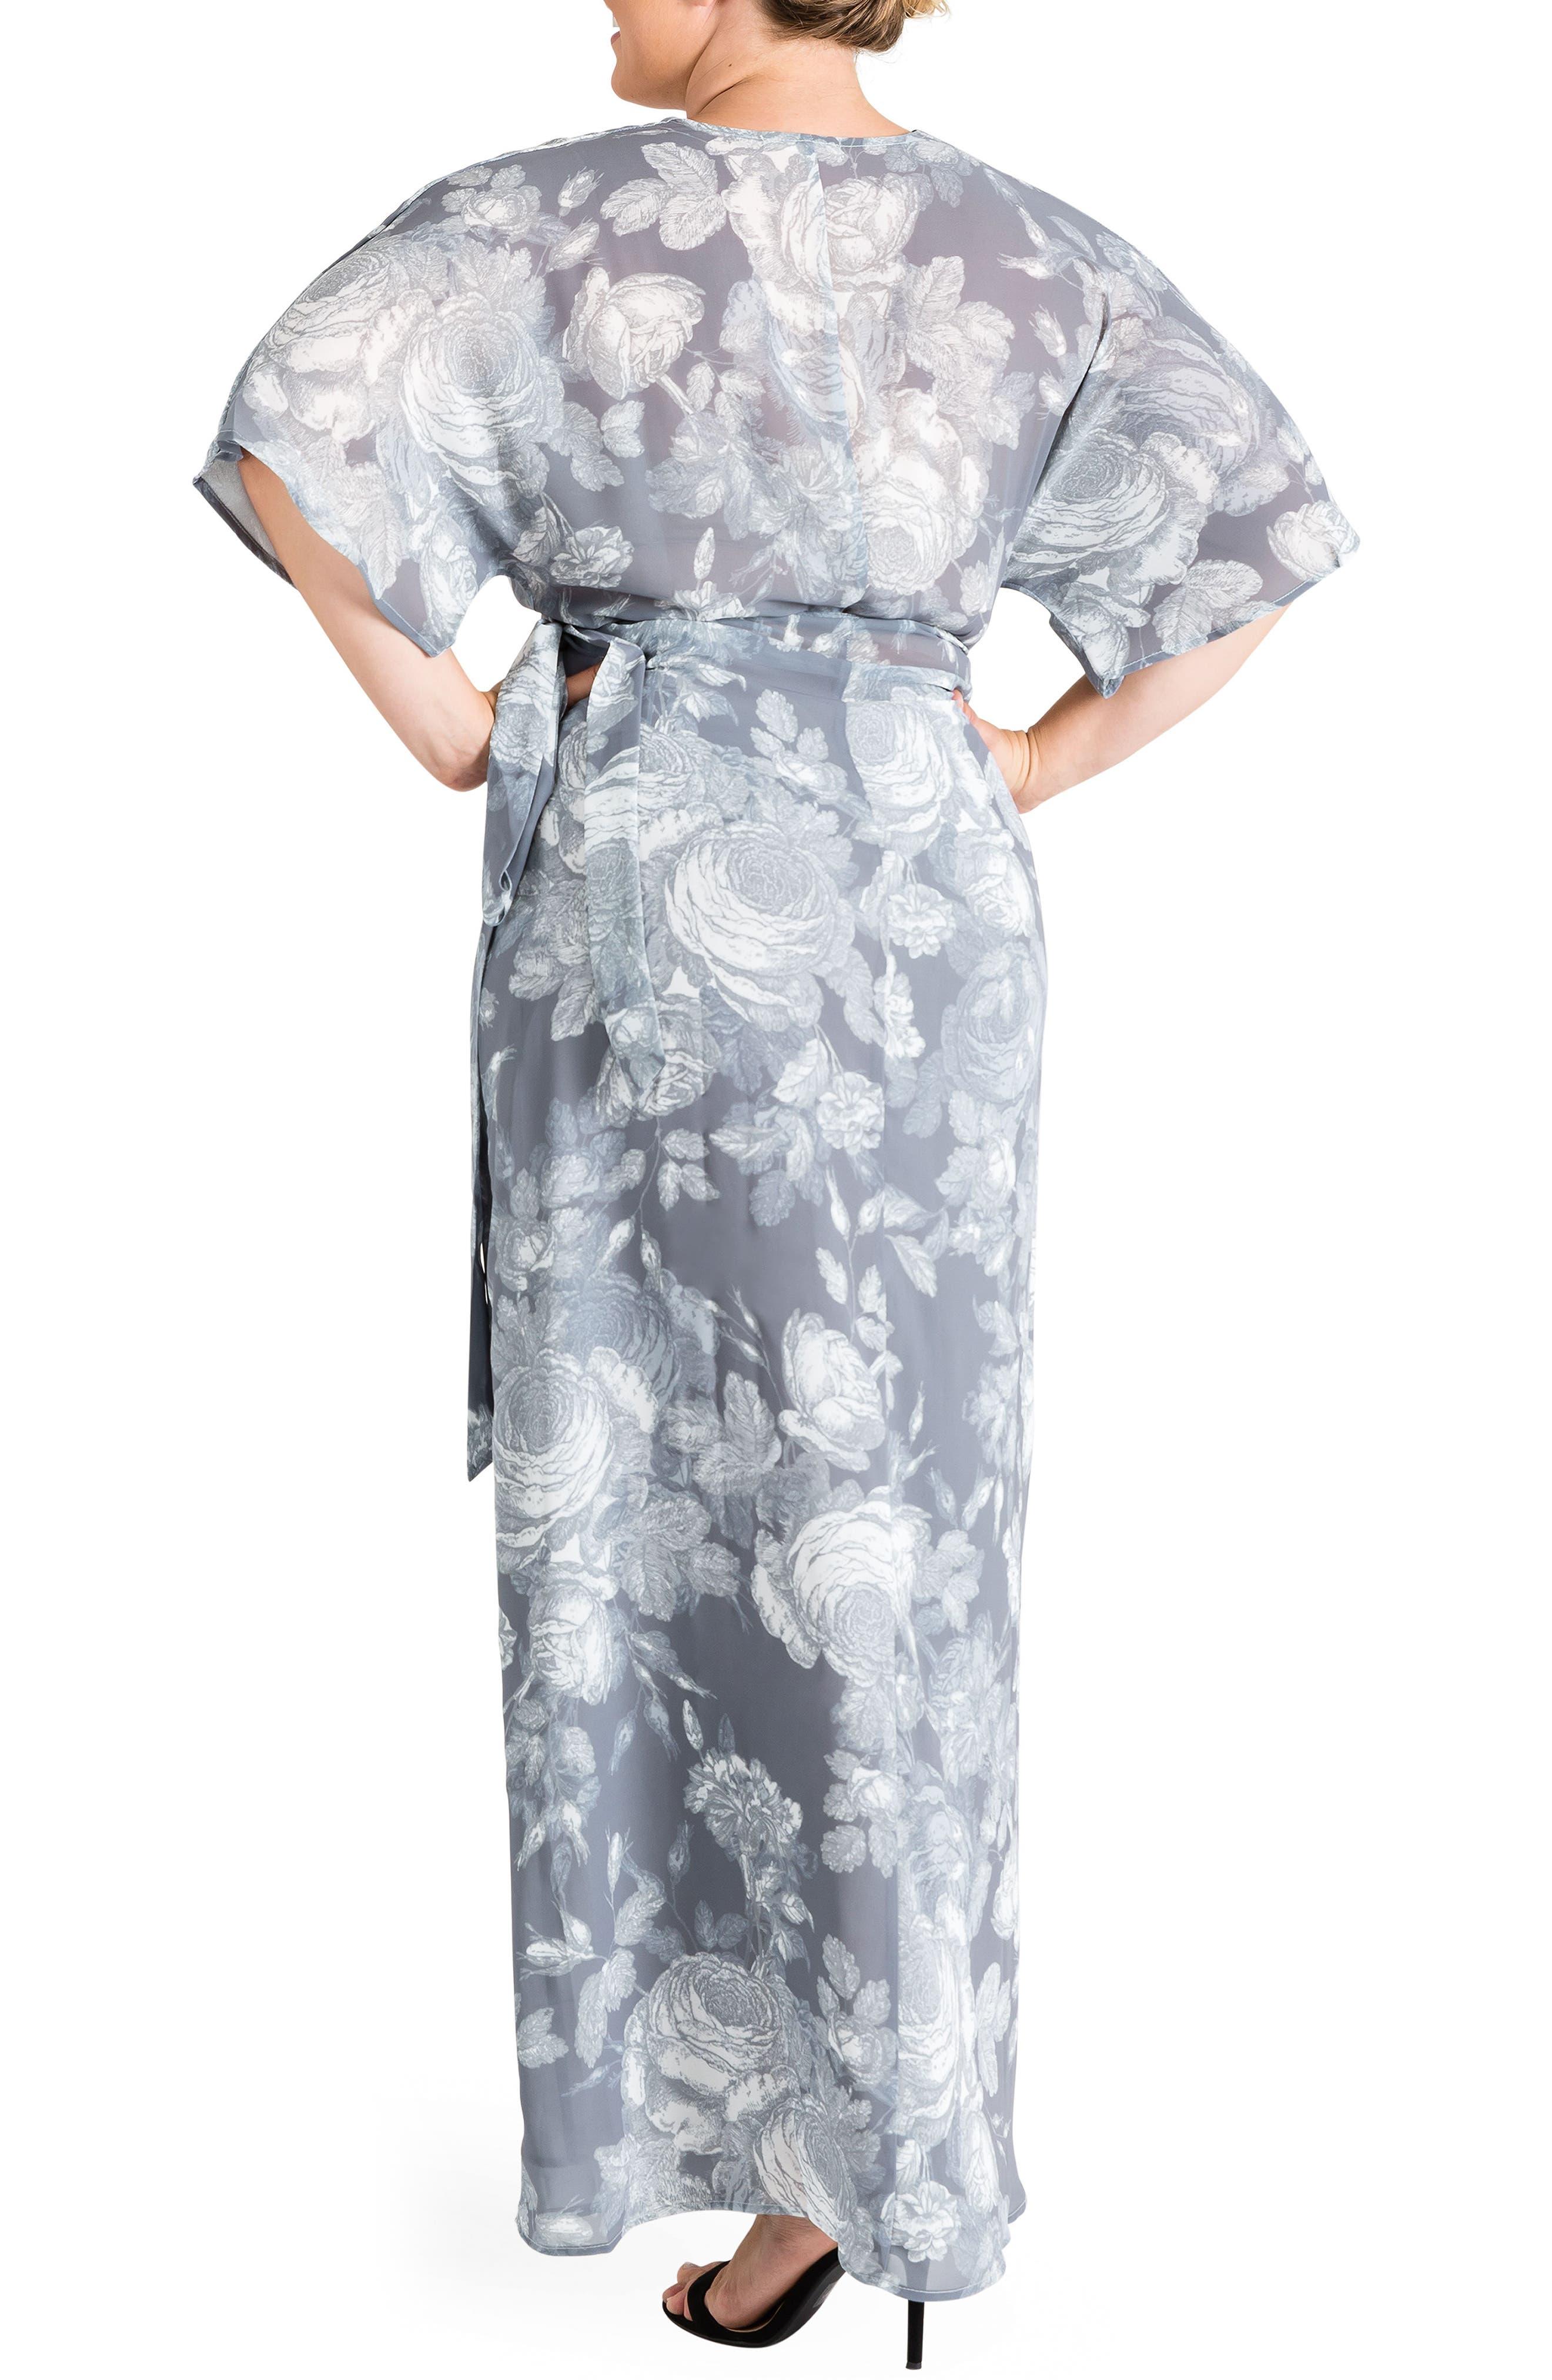 Olivia Print Wrap Maxi Dress,                             Alternate thumbnail 2, color,                             SMOKEY ROSE